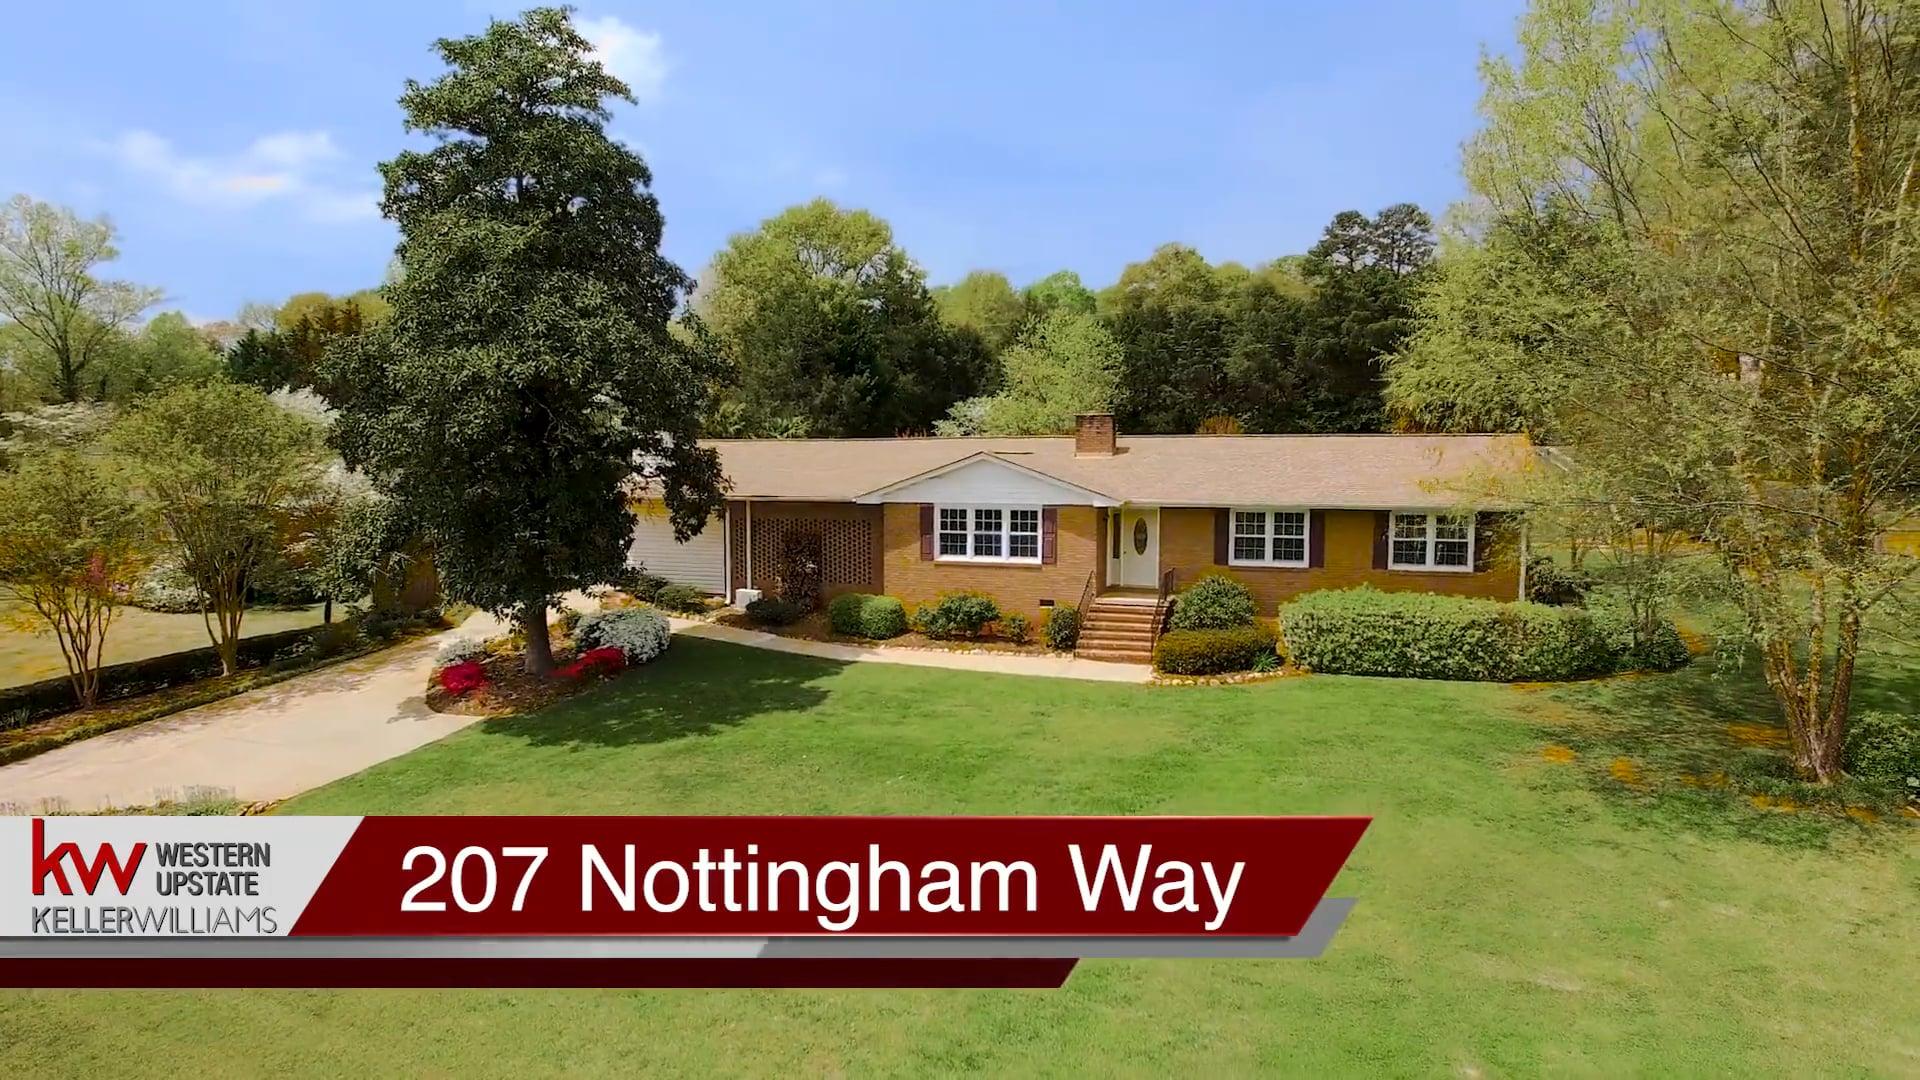 207 Nottingham Way - Anderson, SC 29626